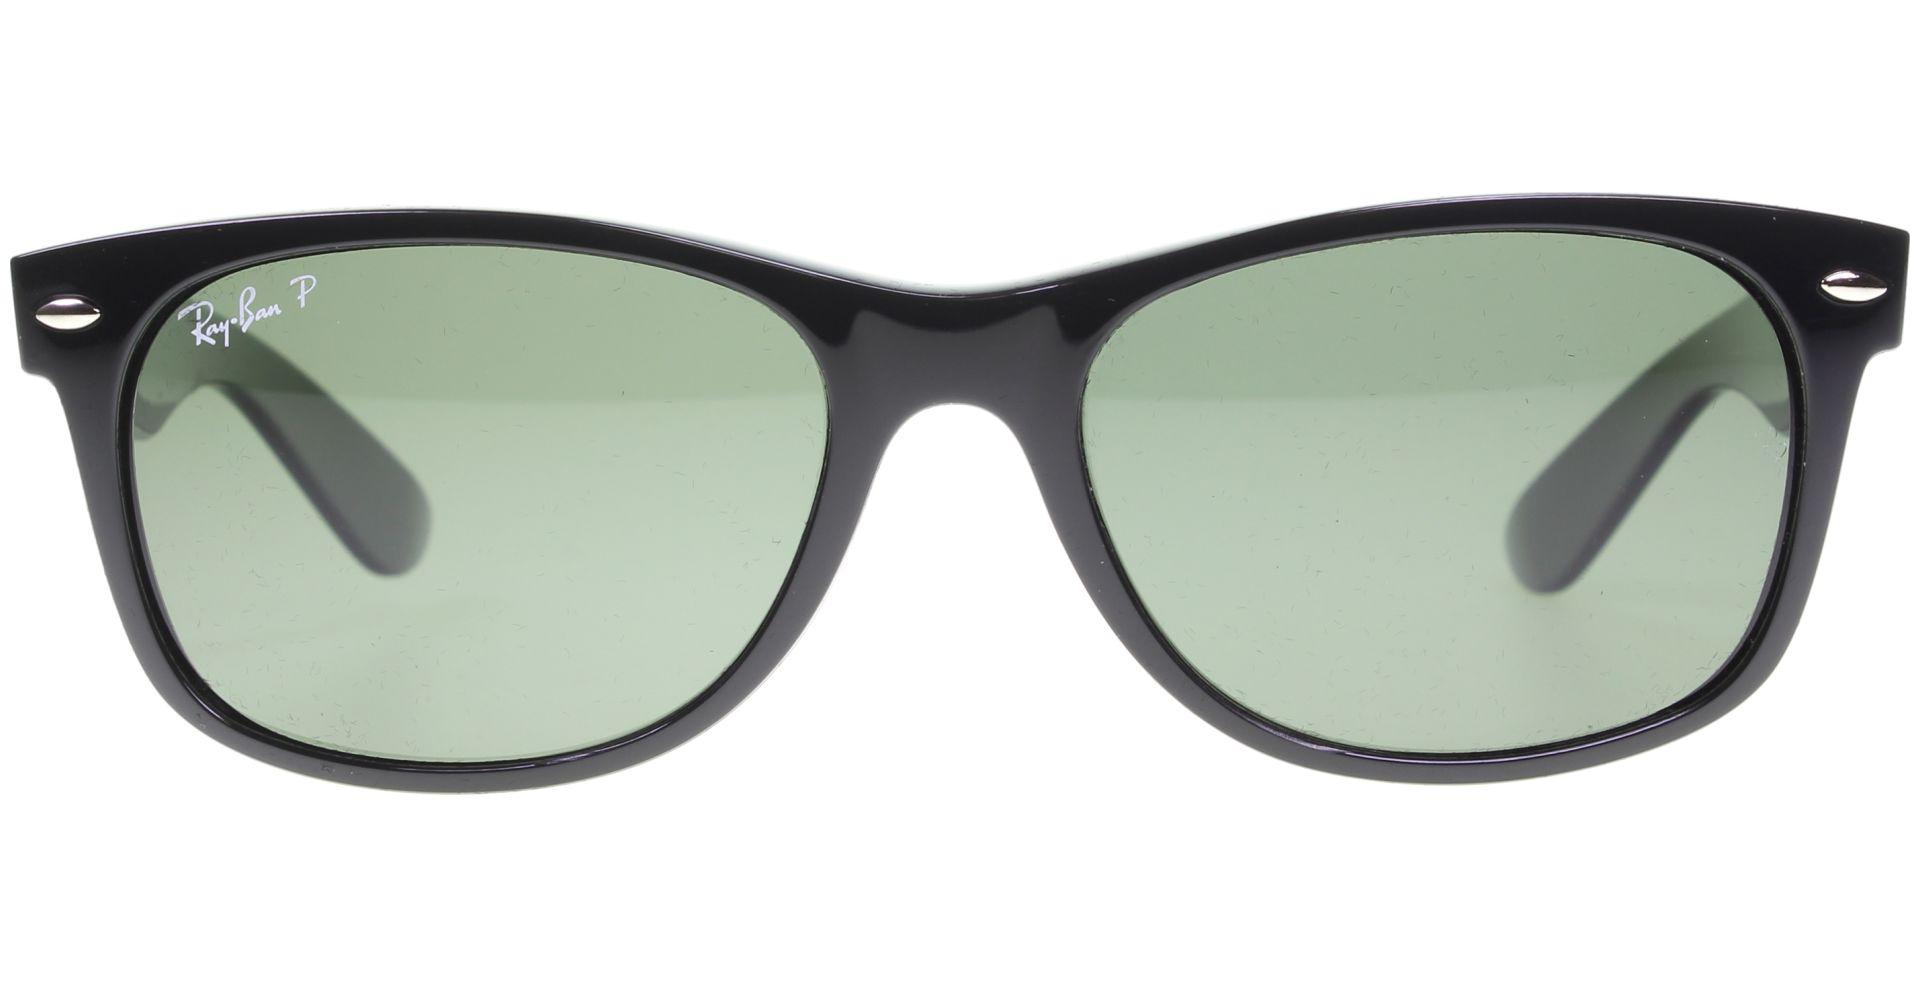 808677e218b Ray-Ban - New Wayfarer 2132 901 58 5518 Black - von Lensbest